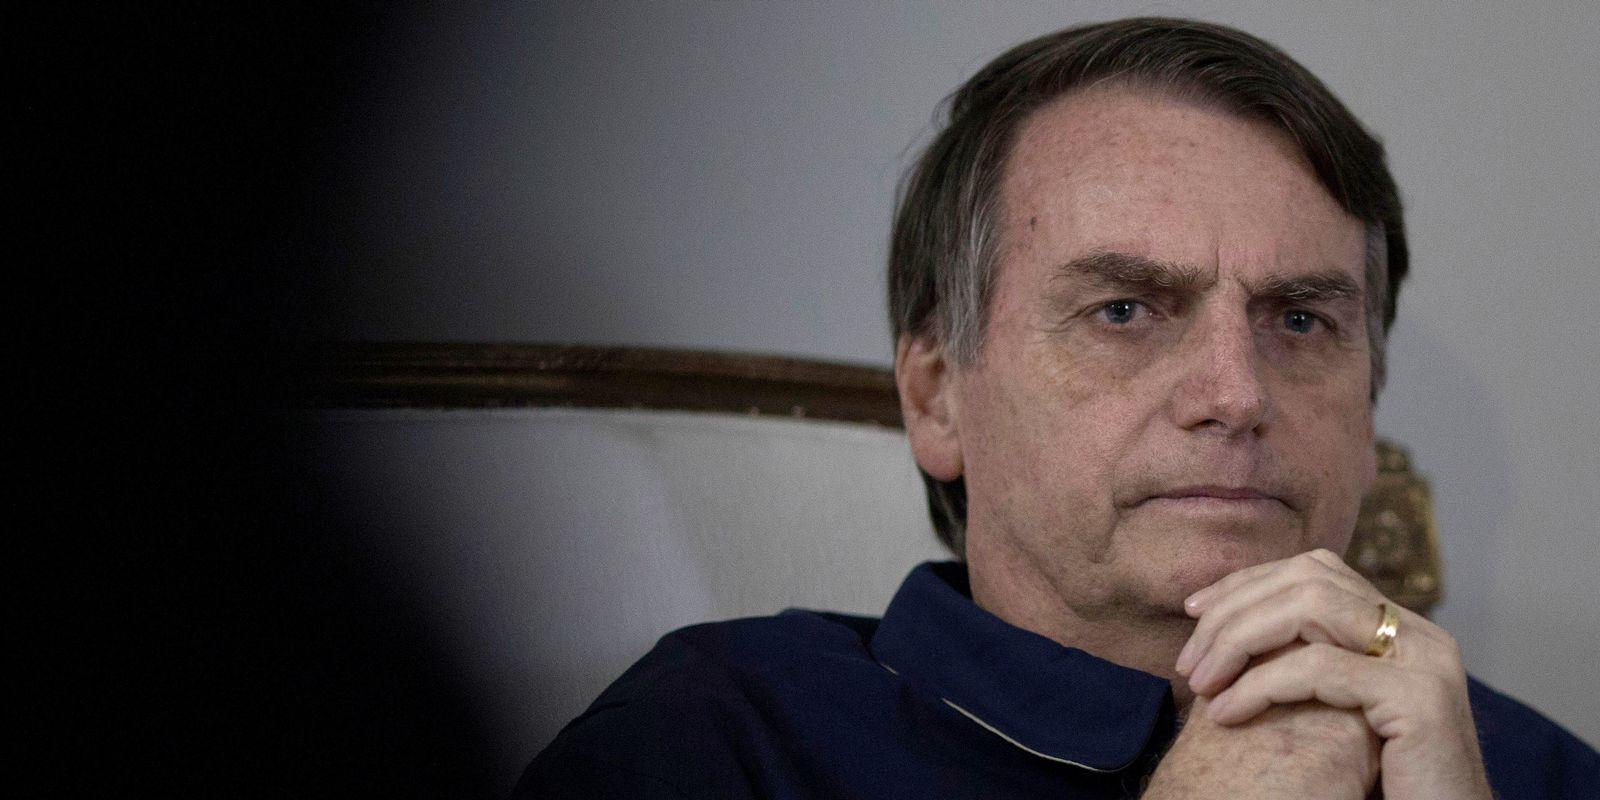 Jair Bolsonaro/ Brasilien